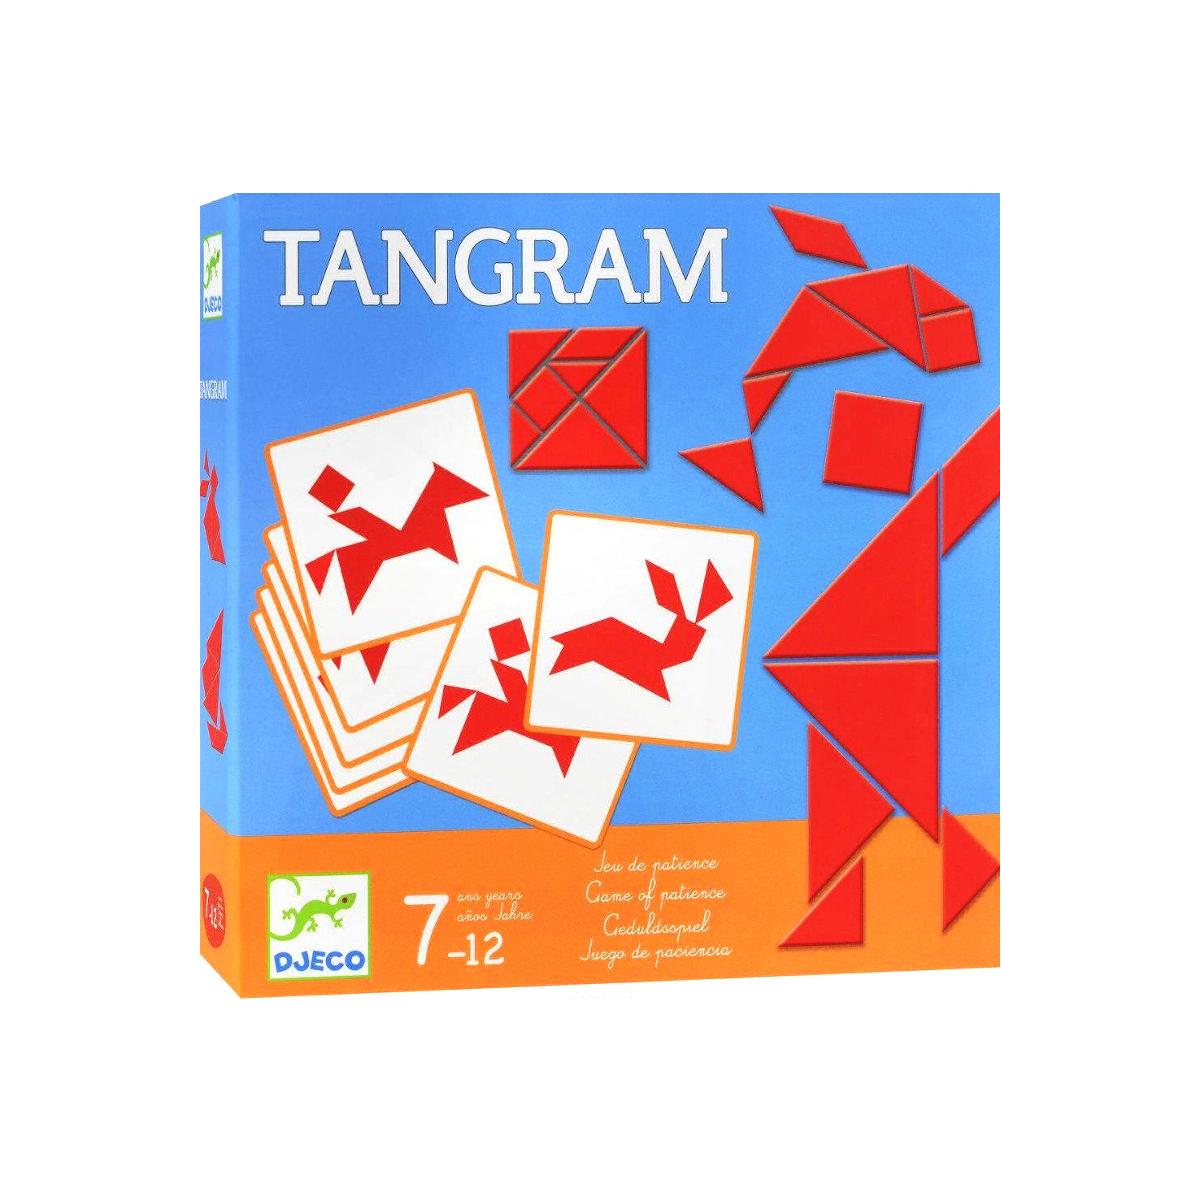 Jeu D'adresse 'tangram' - À Partir De 7 Ans concernant Tangram Enfant